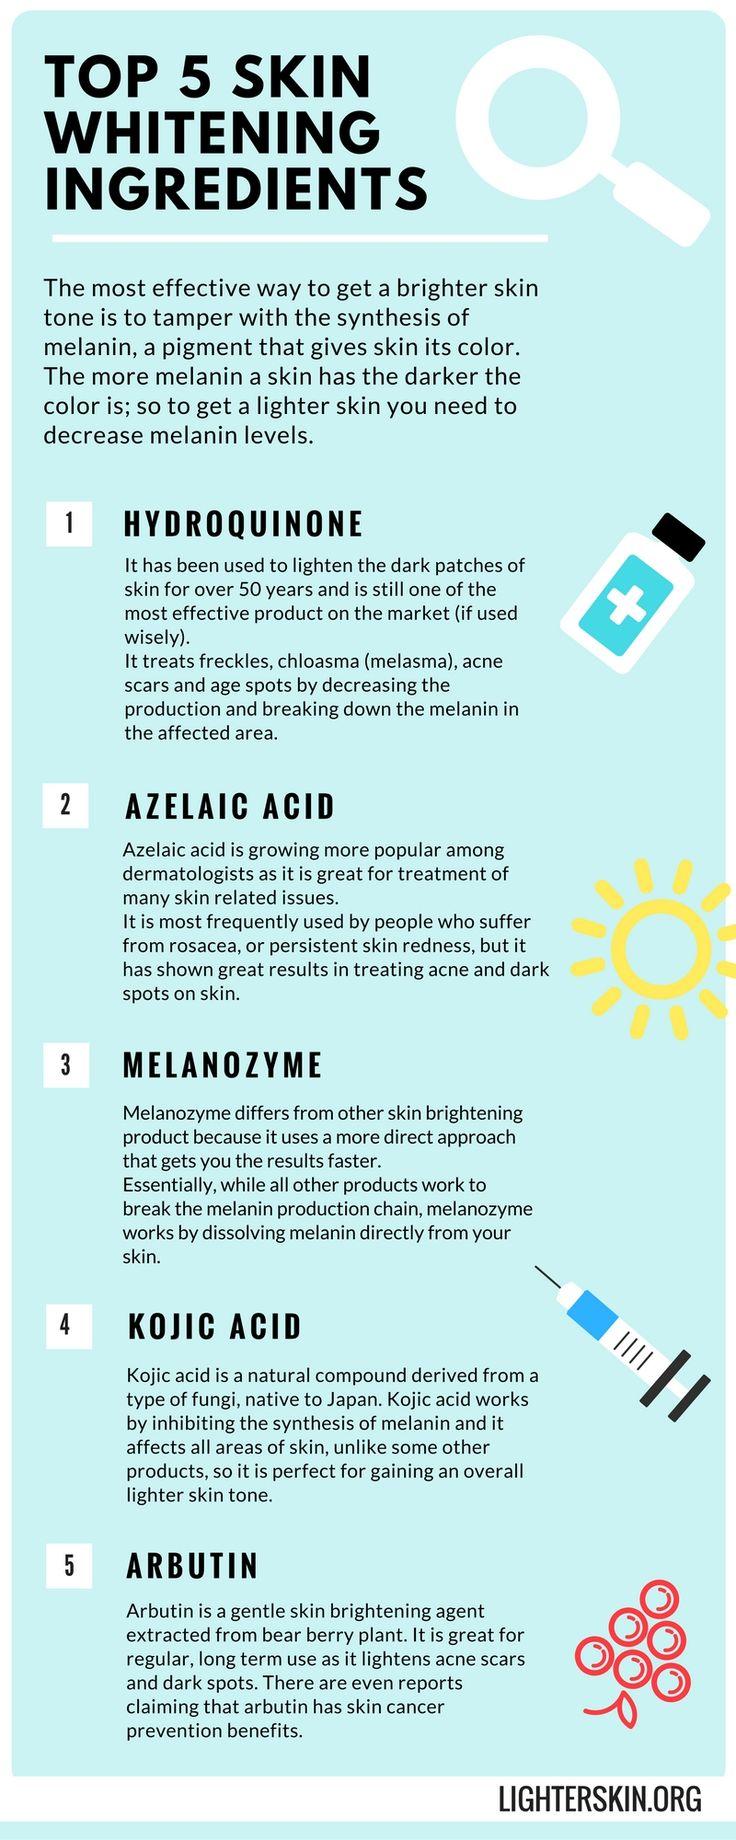 #ingredients #whiteningingredients #skinwhitening #top5 #hydroquinone #azelaicacid #melanozyme #kojicacid #arbutin #creams #melanin #darkspots #lighterskin